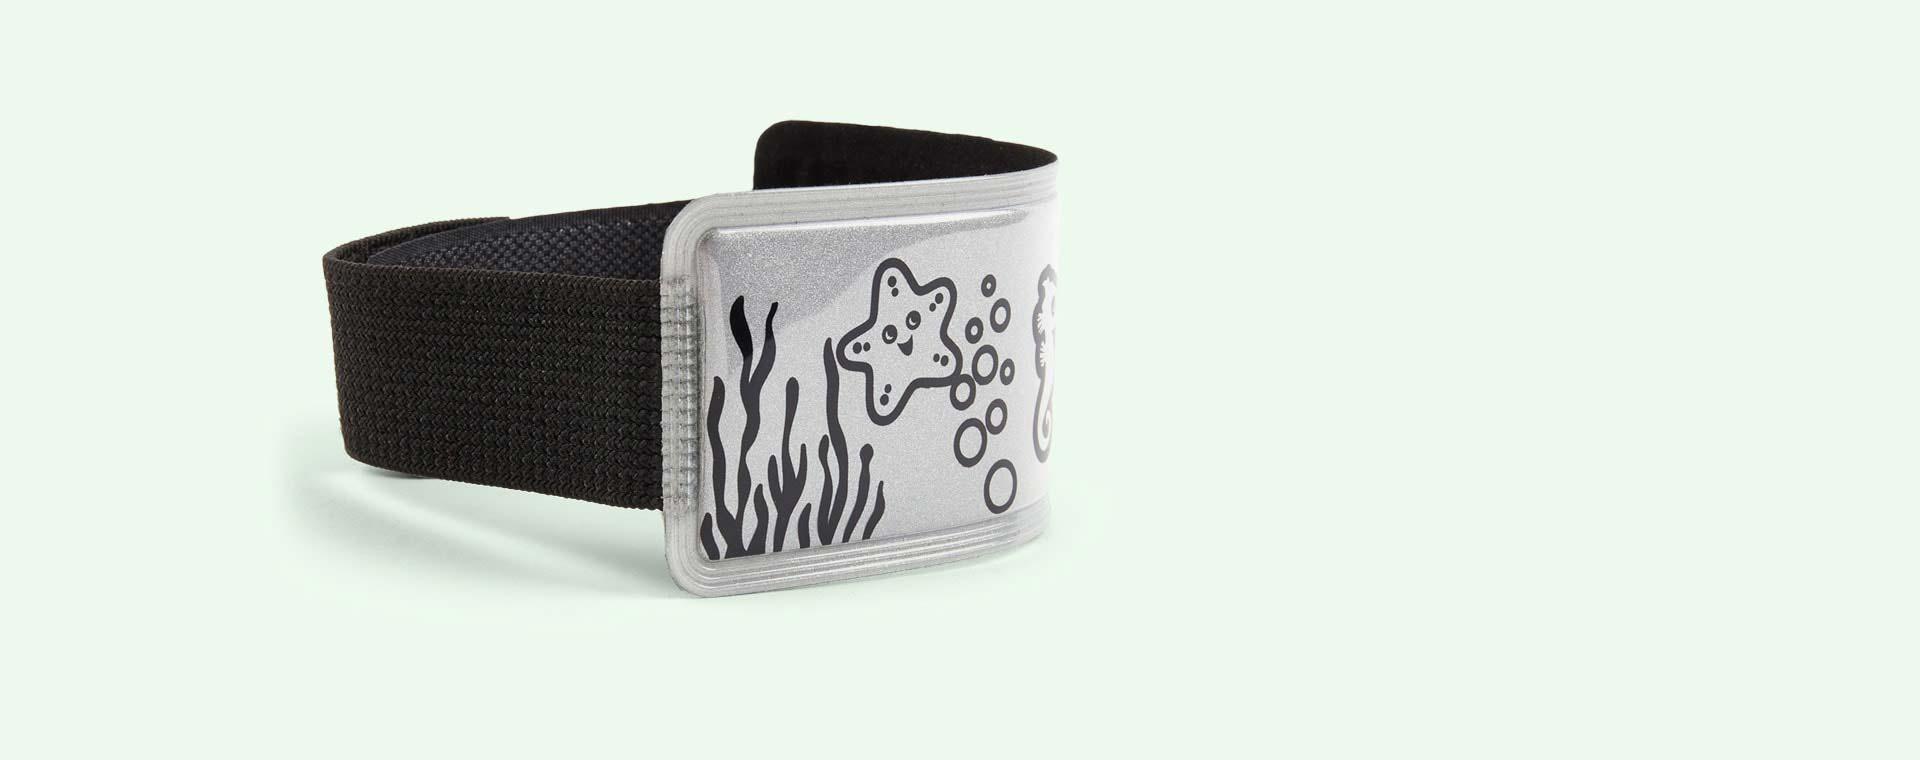 Ocean Reef Pogu Reflective Armband